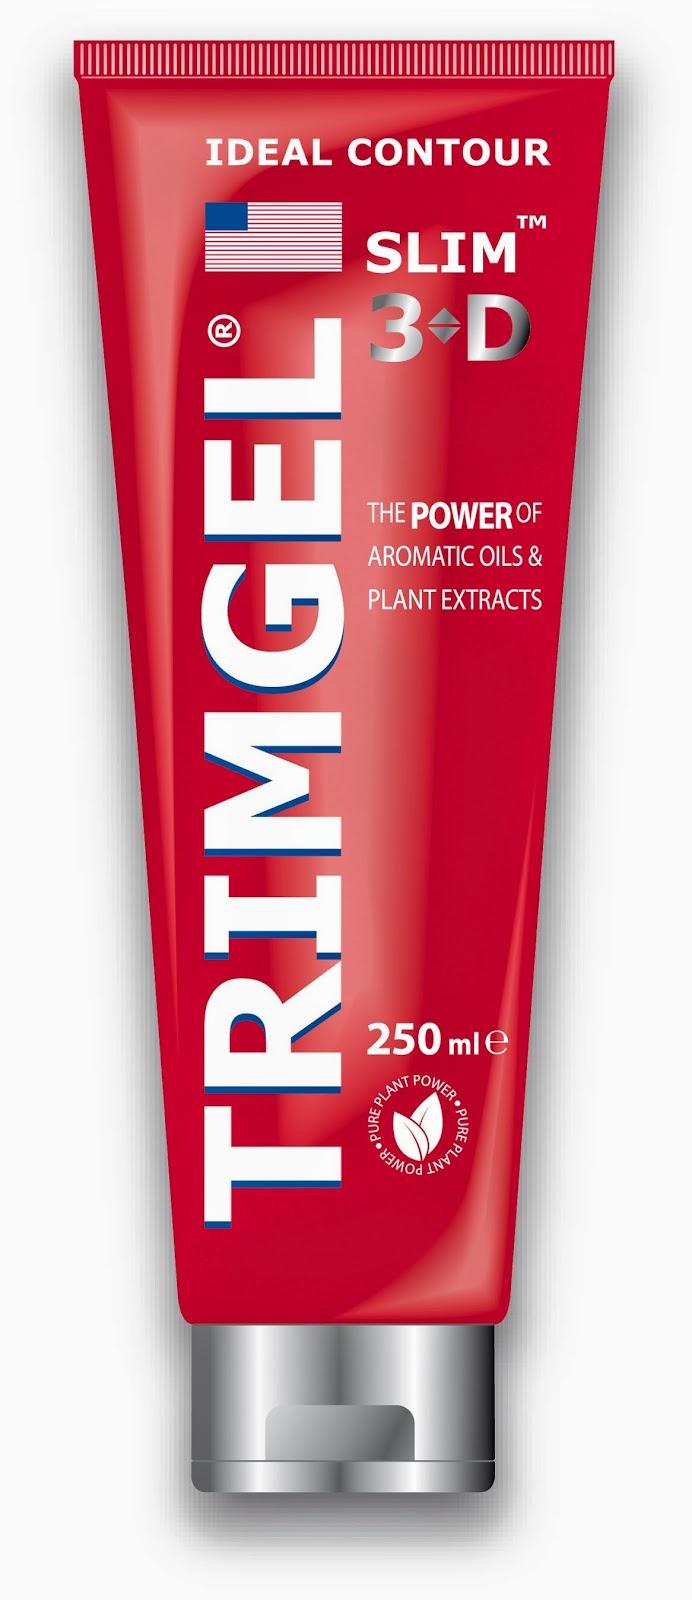 Trimgel Slim 3d